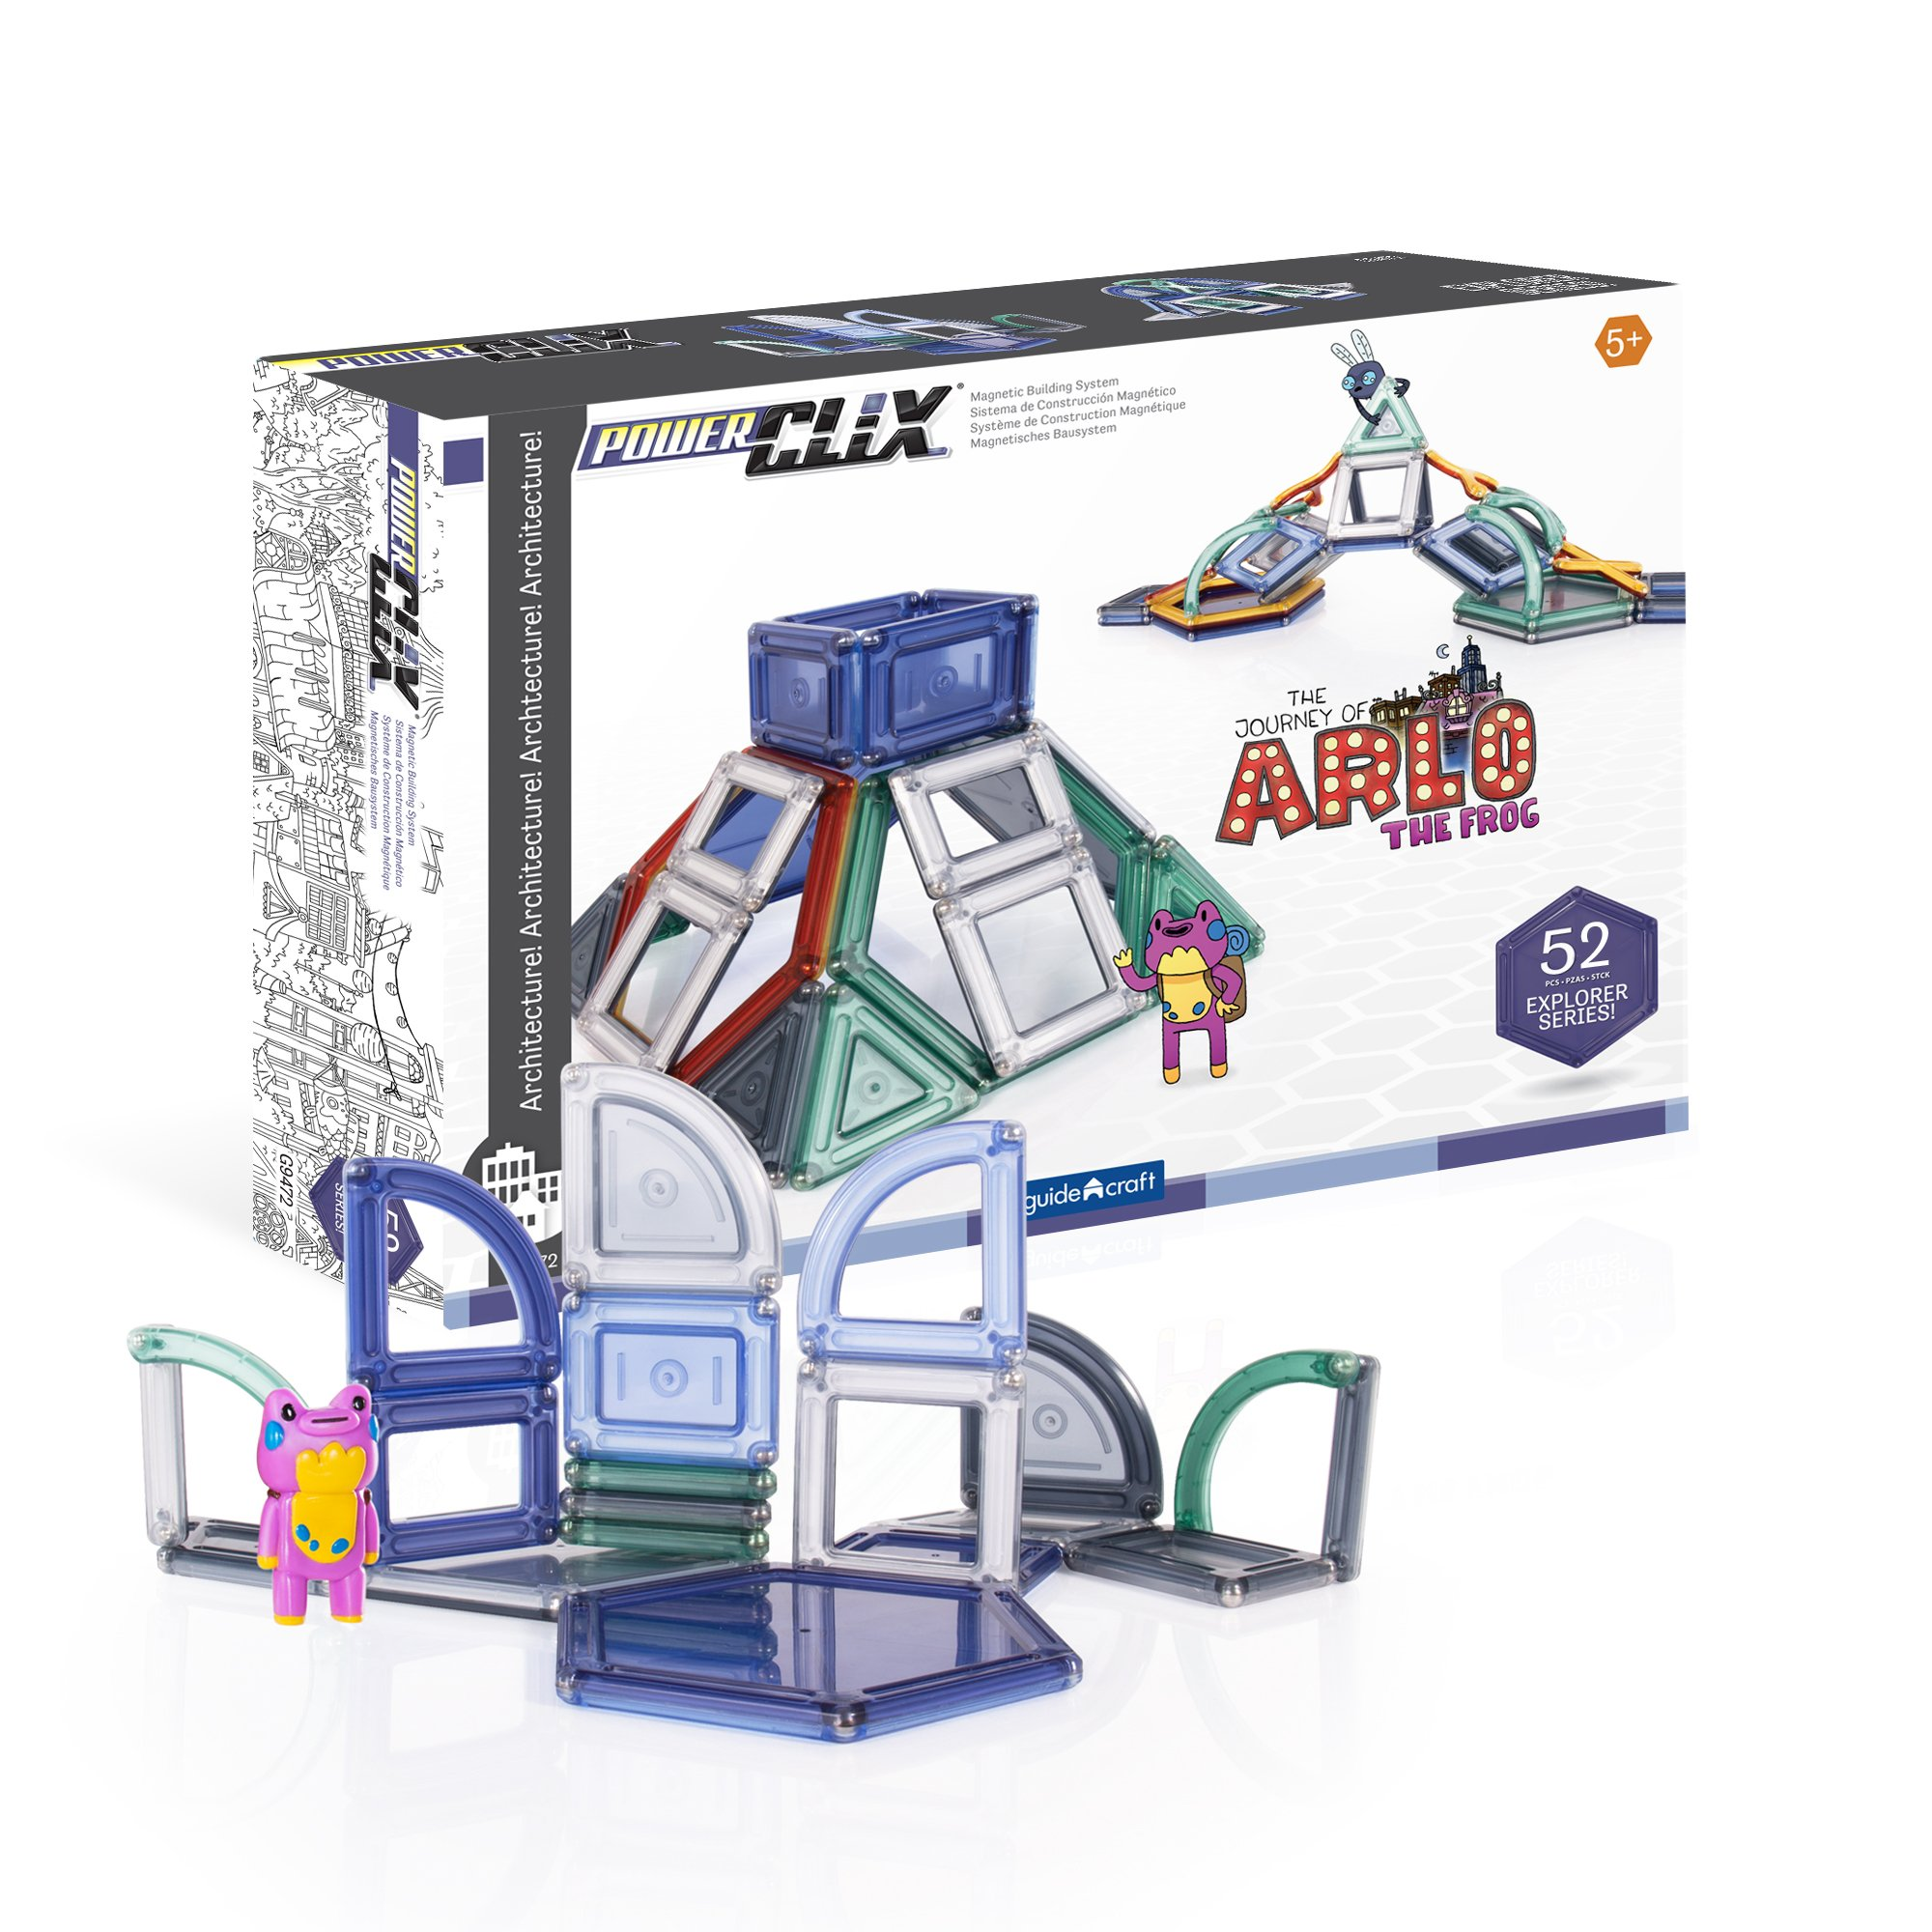 Guidecraft PowerClix Explorer Series - Architecture Magnetic Building Set, STEM Imagination Creativity Skill Development Toy